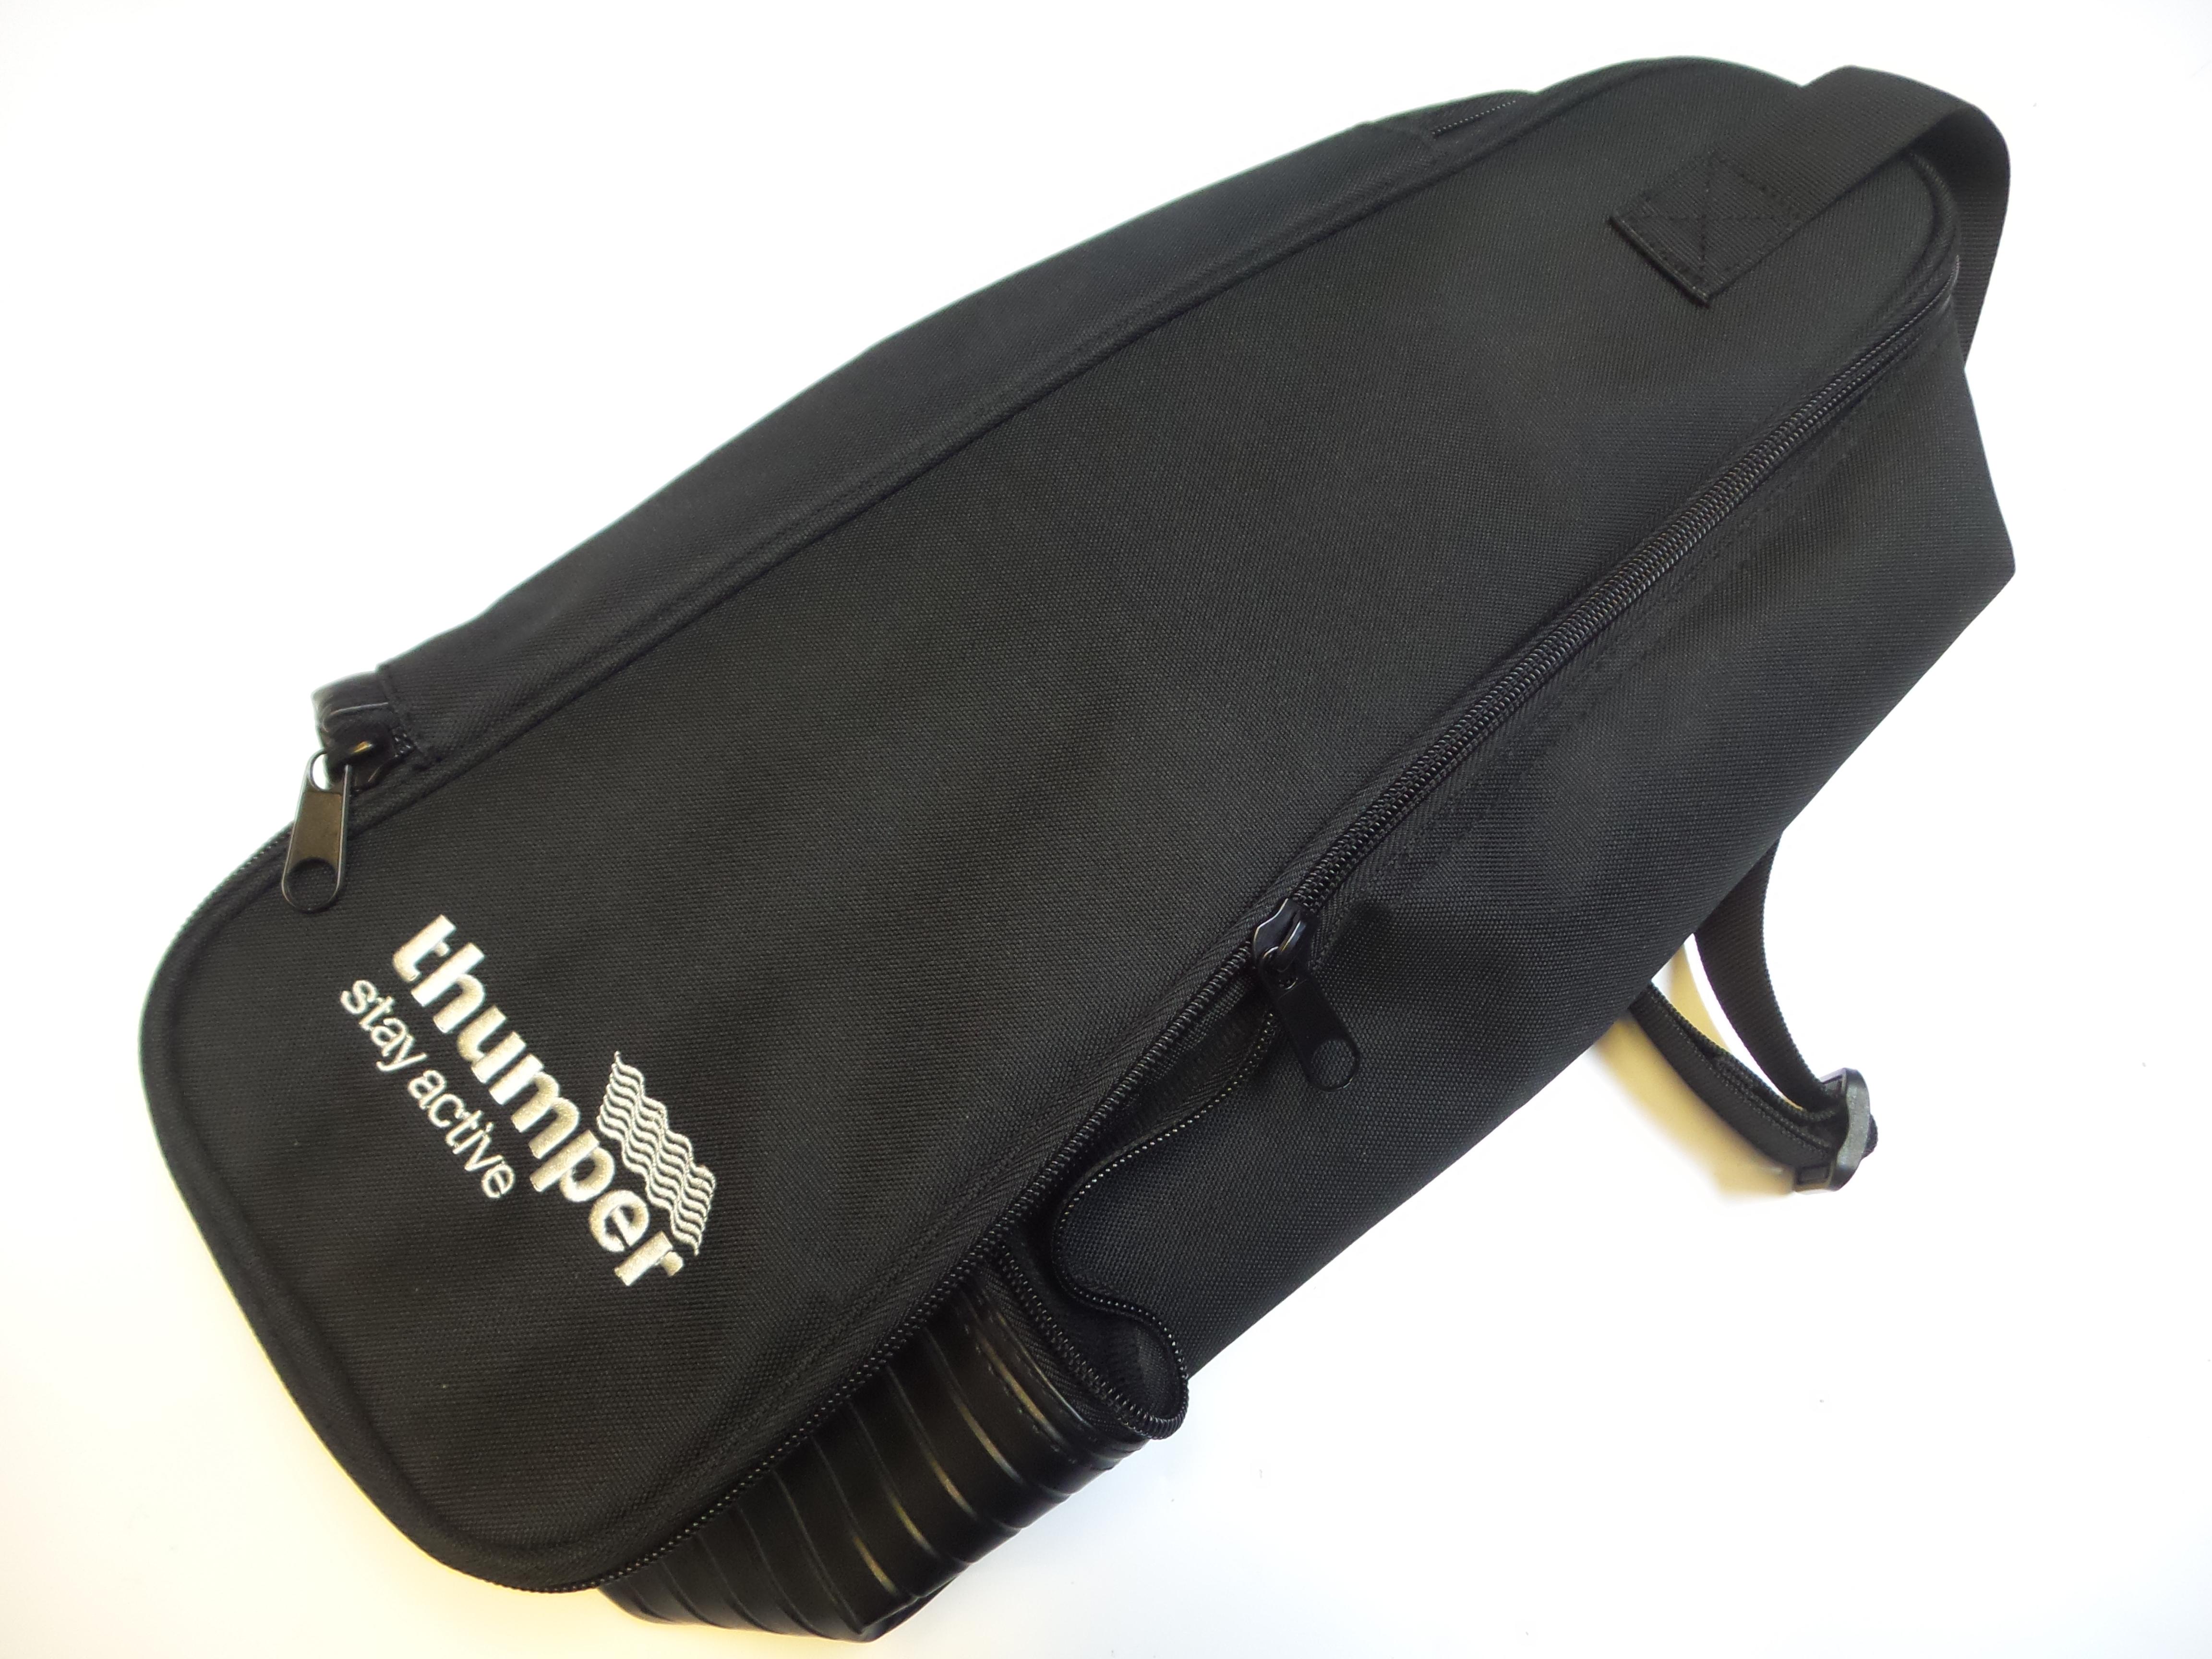 Fabrication Enterprises 14-1085 Thumper Mini-Pro 2 Body Massager, Carry Bag Only